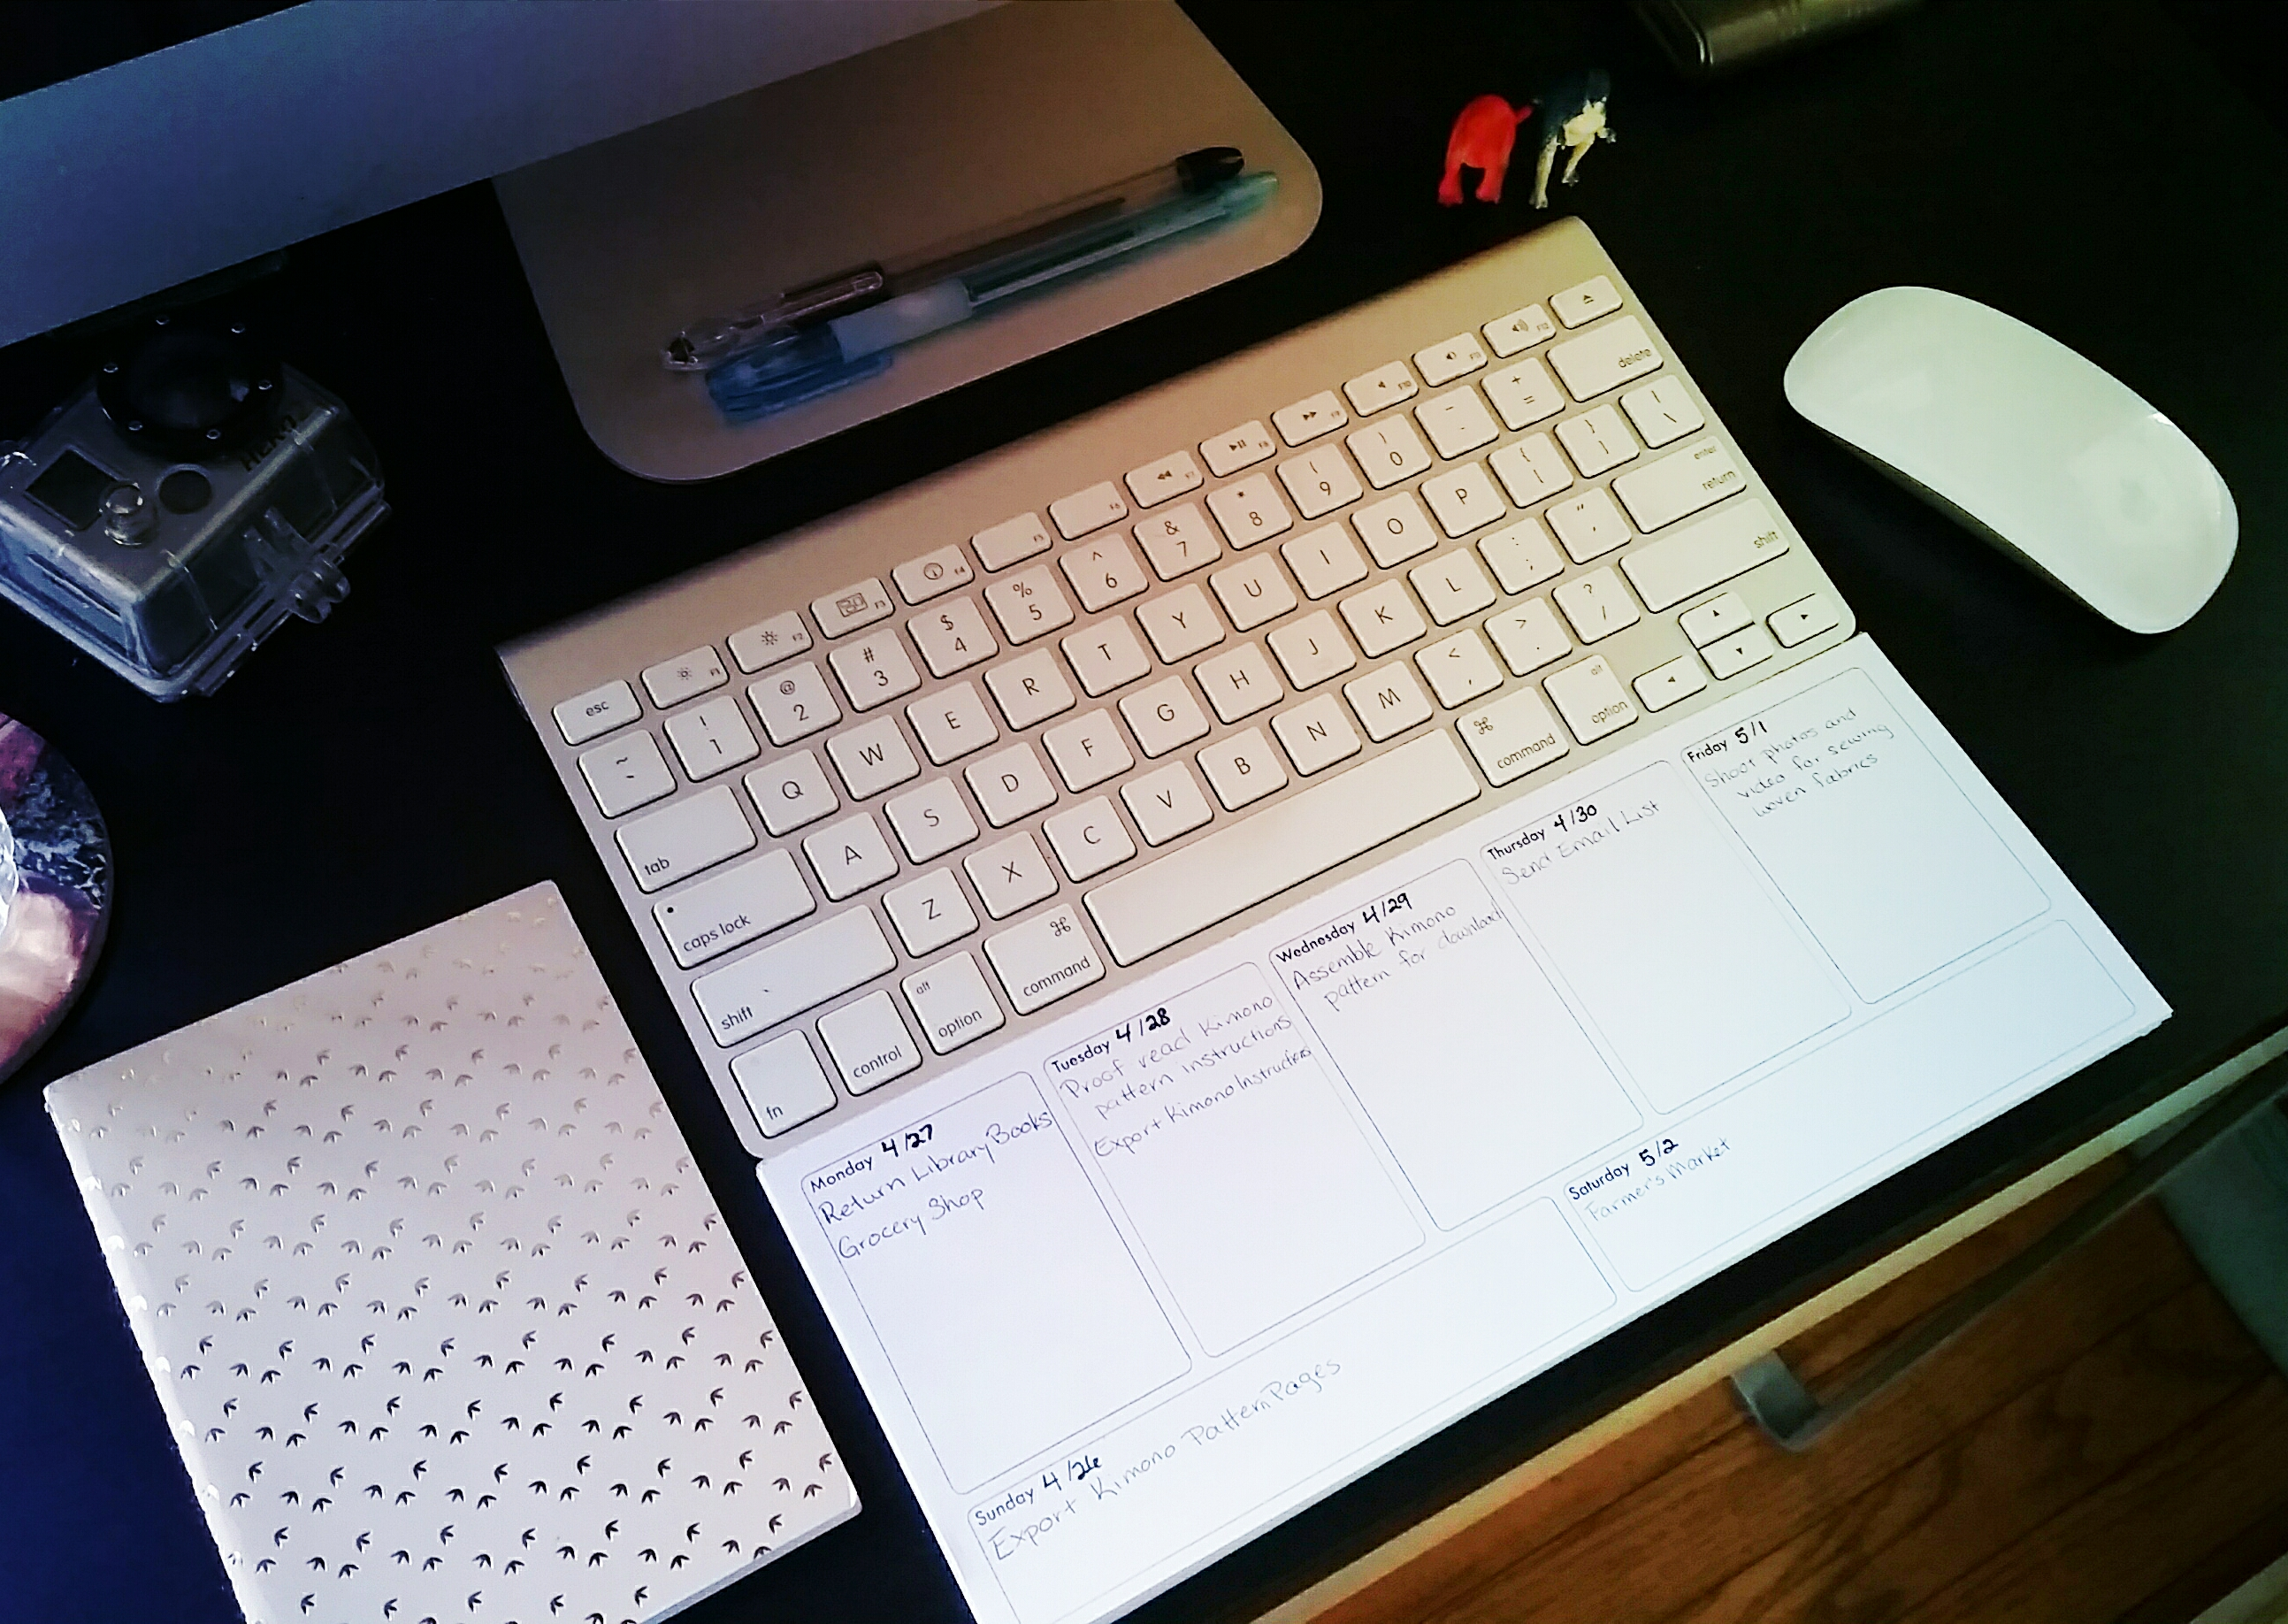 Diy Calendar App : Notepad desk calendar how did you make this luxe diy